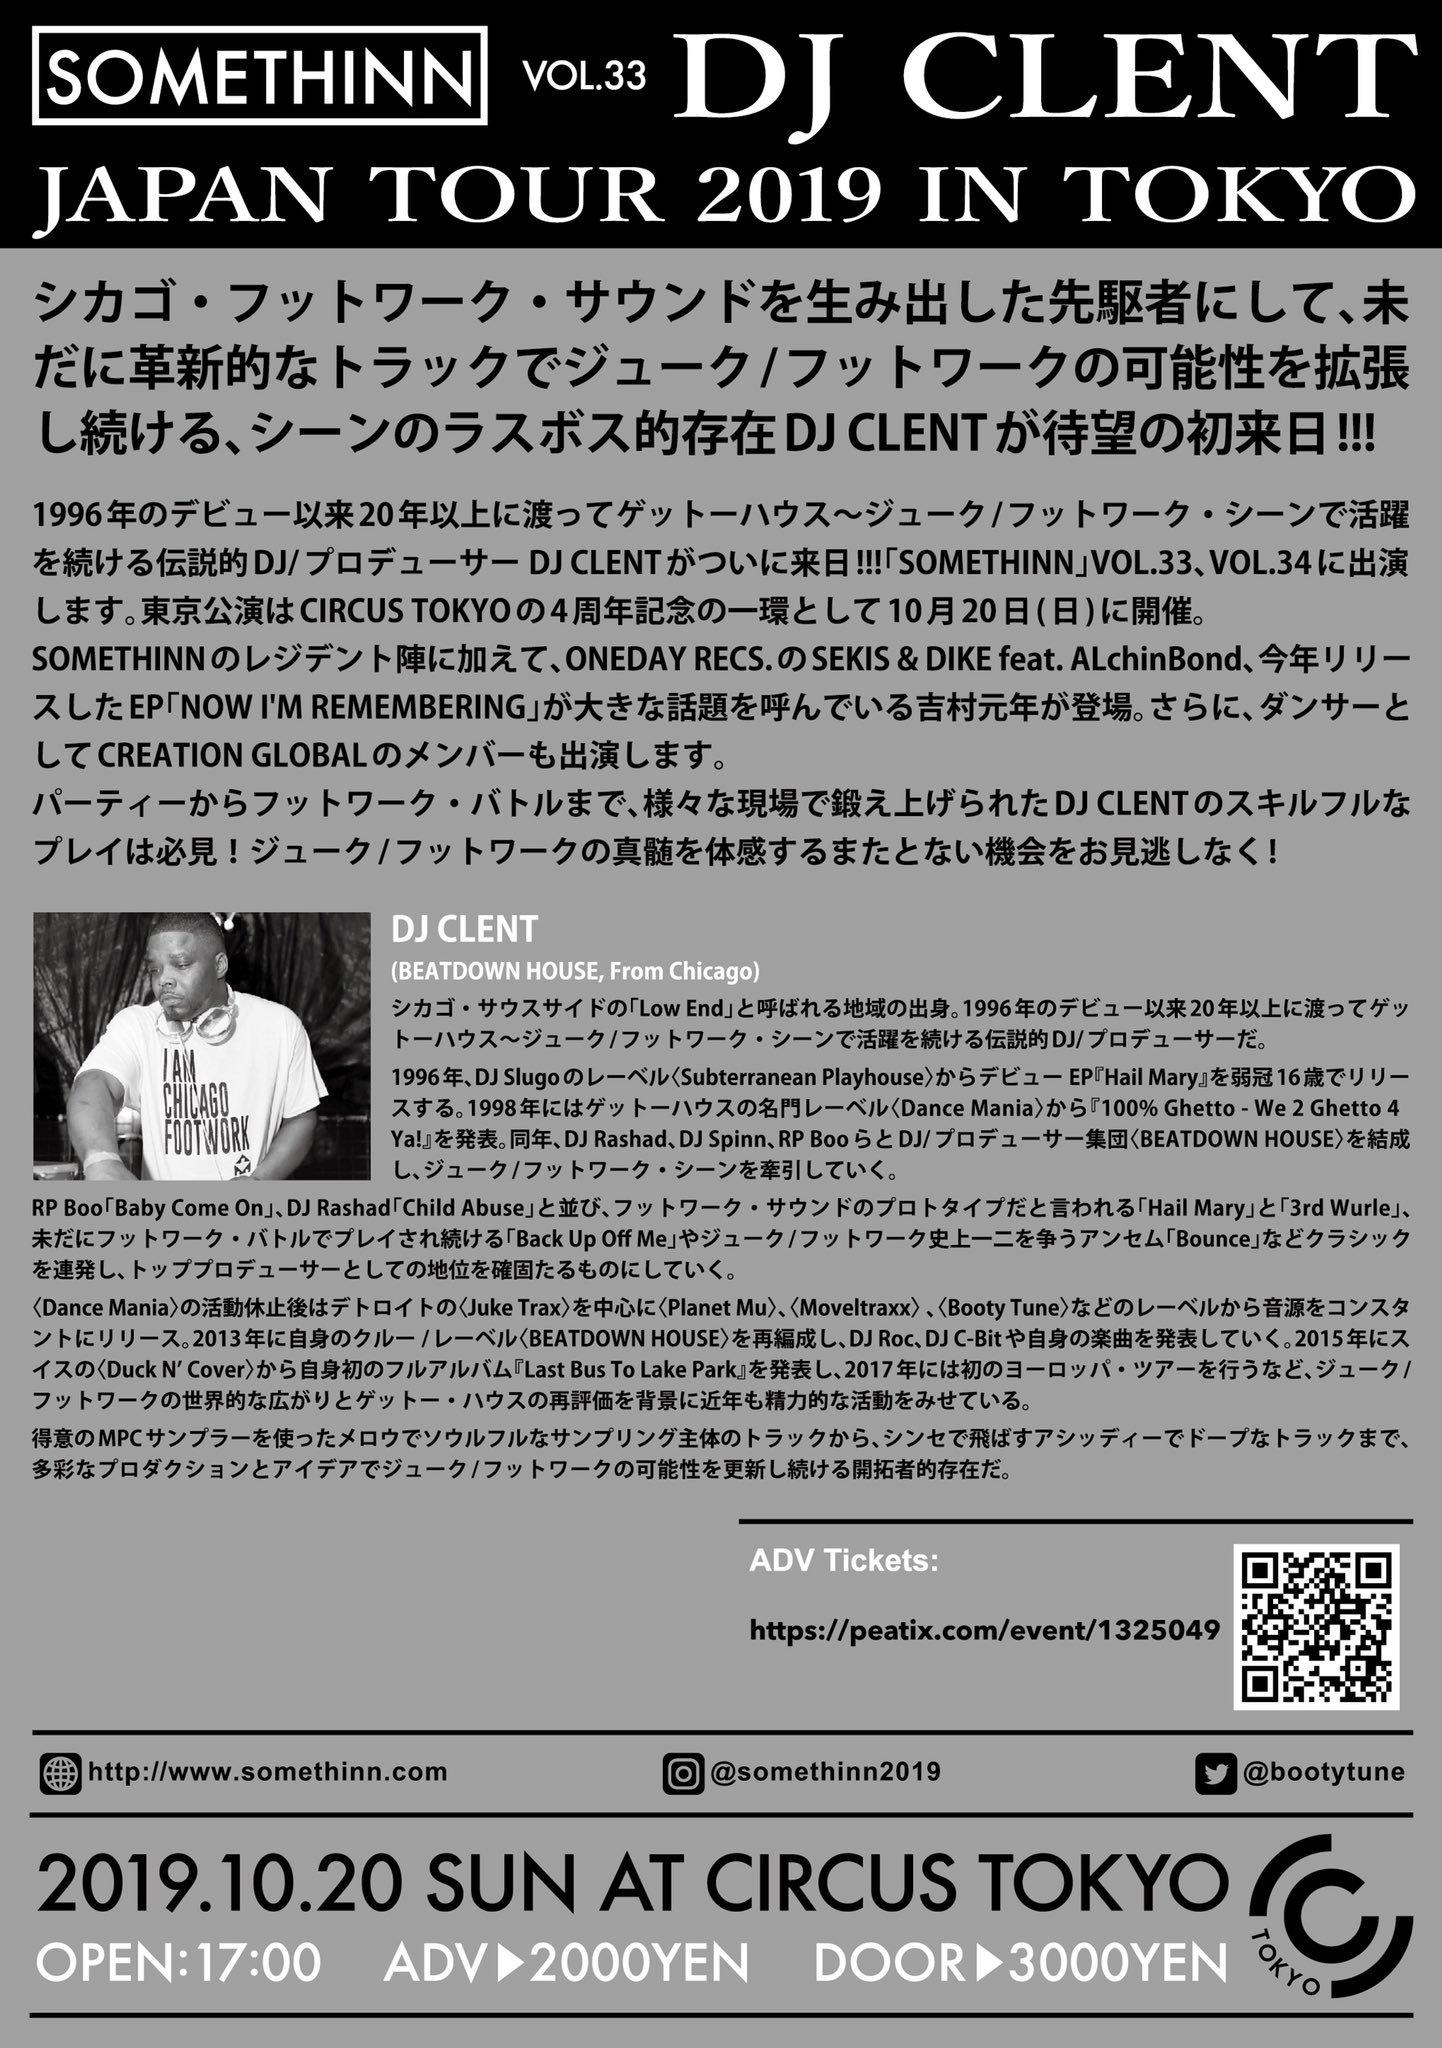 2019.10.21(SUN)SOMETHINN VOL.33 DJ CLENT JAPAN TOUR 2019 IN TOKYO @CIRCUSTOKYO